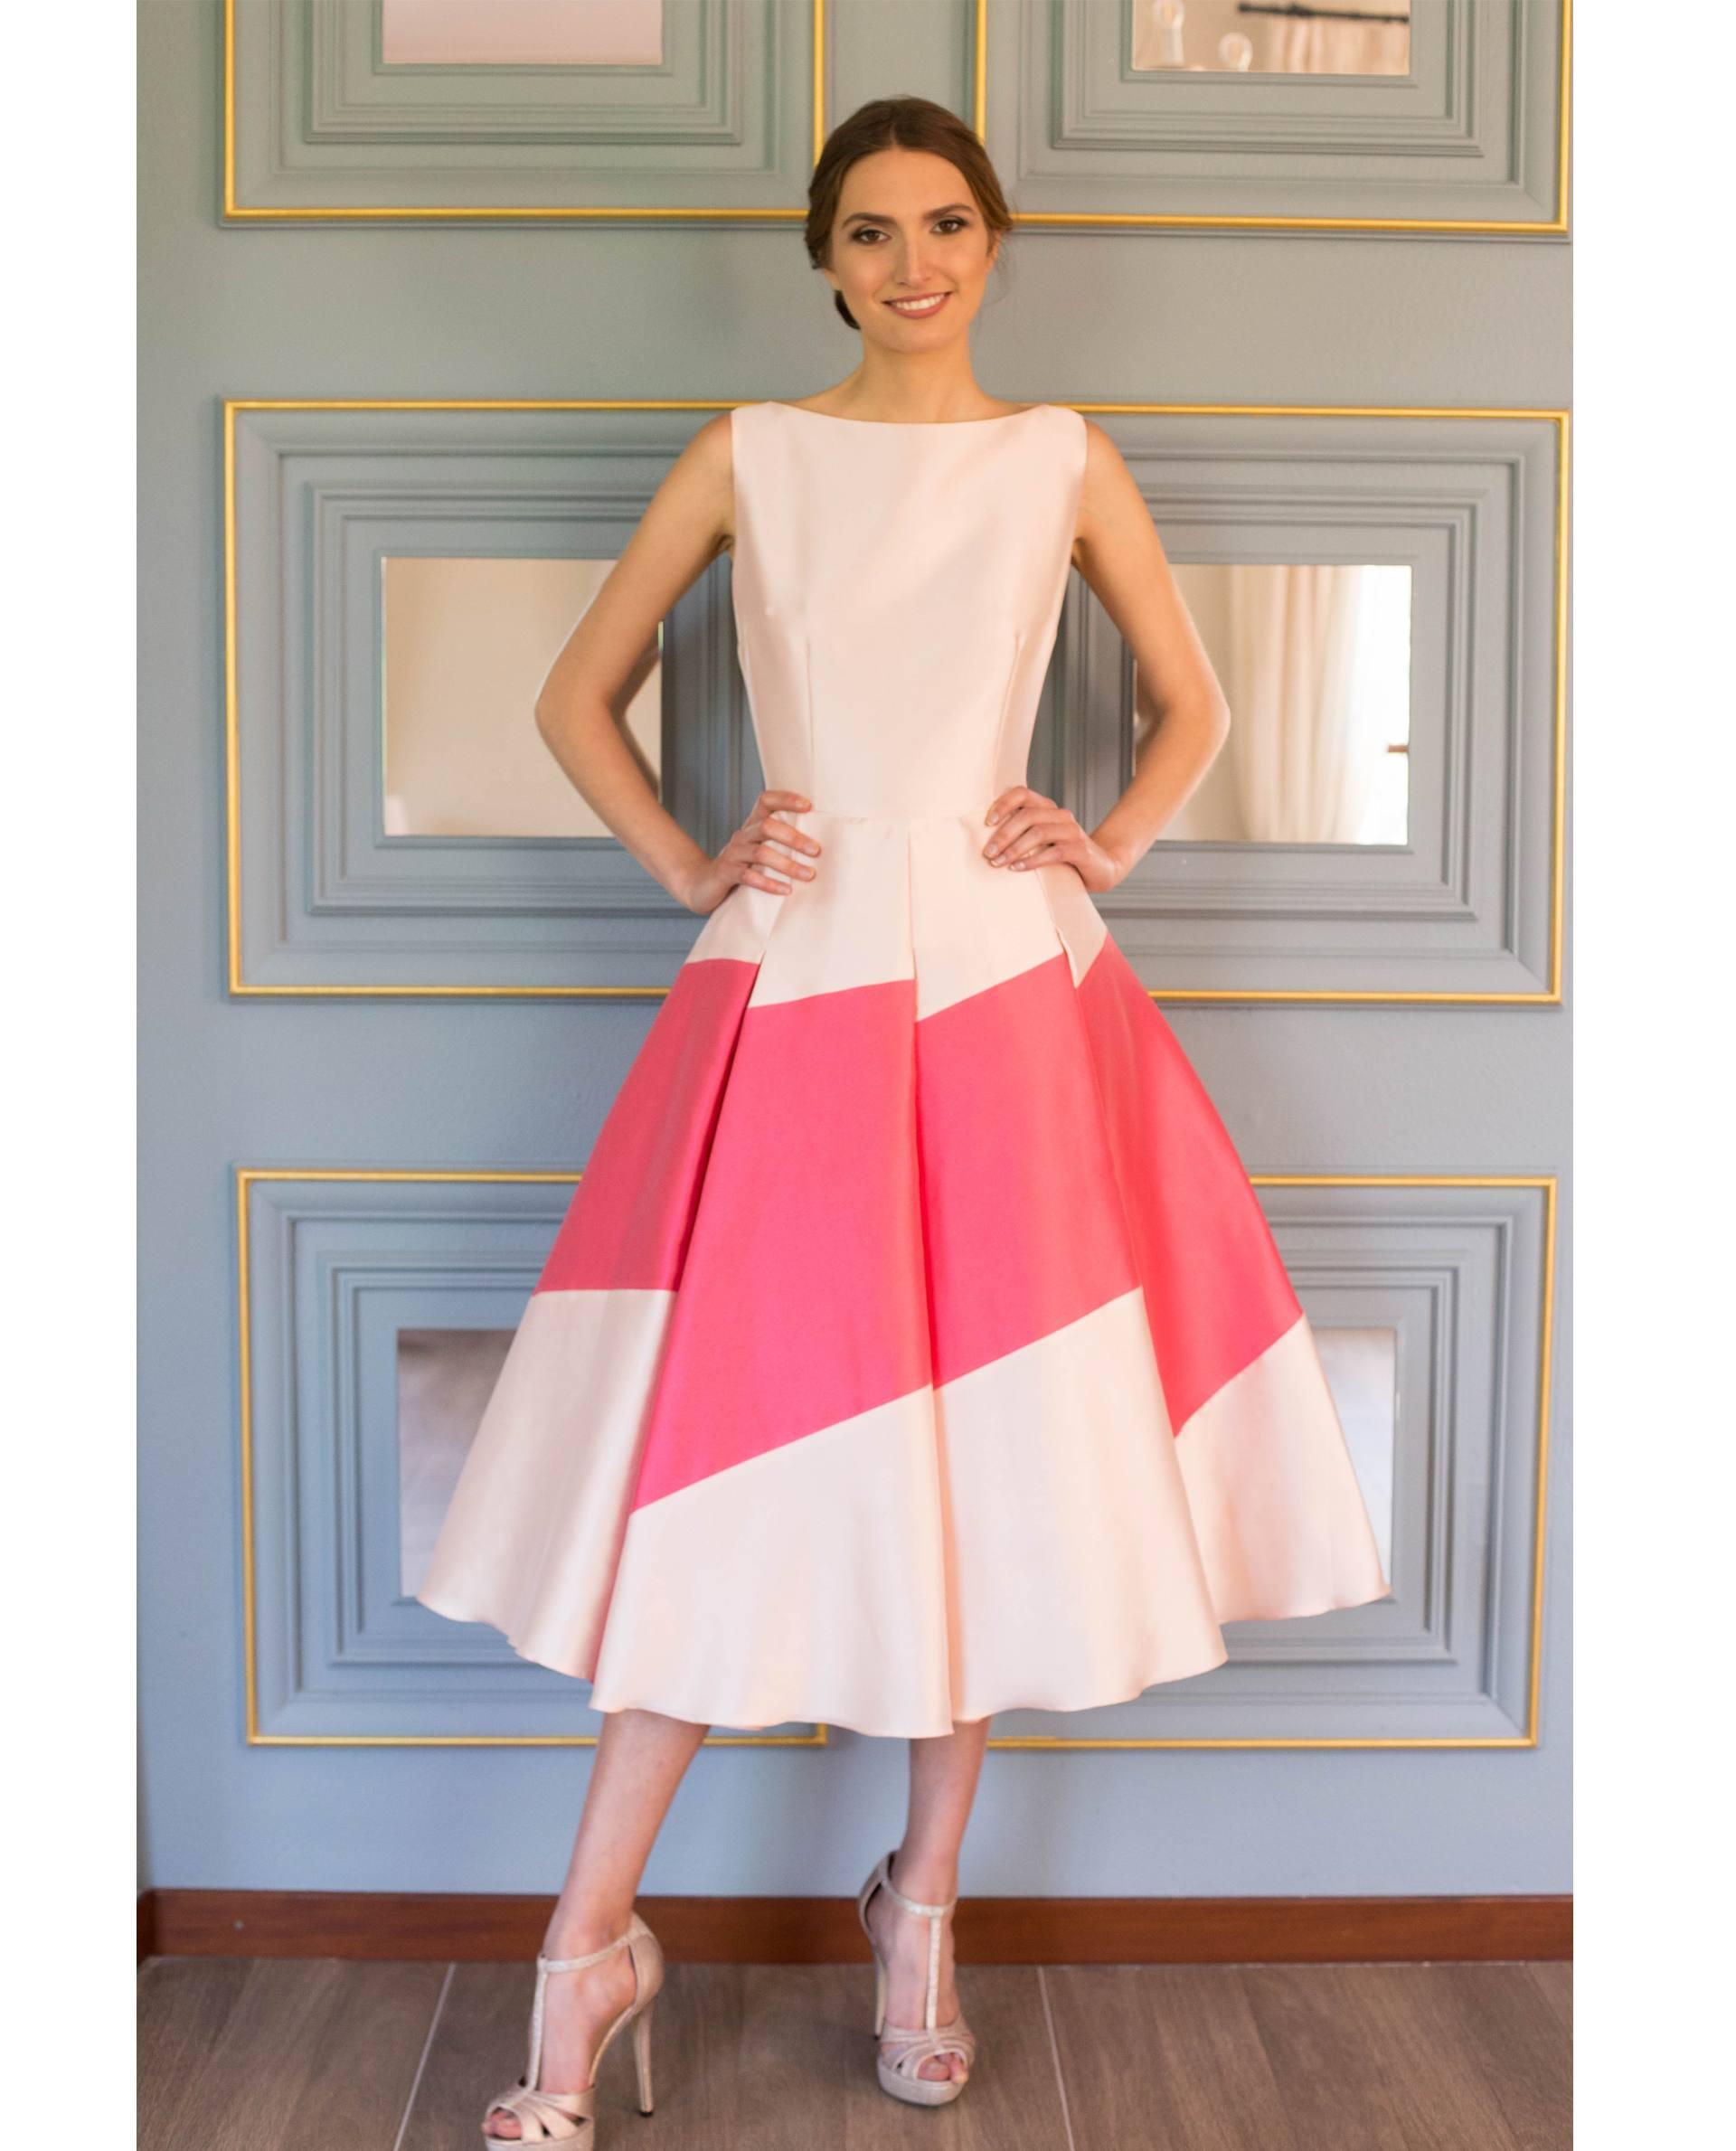 ATELIER-NATURE 2019 - VESTIDOS - vestido fiesta ANNIE rosa